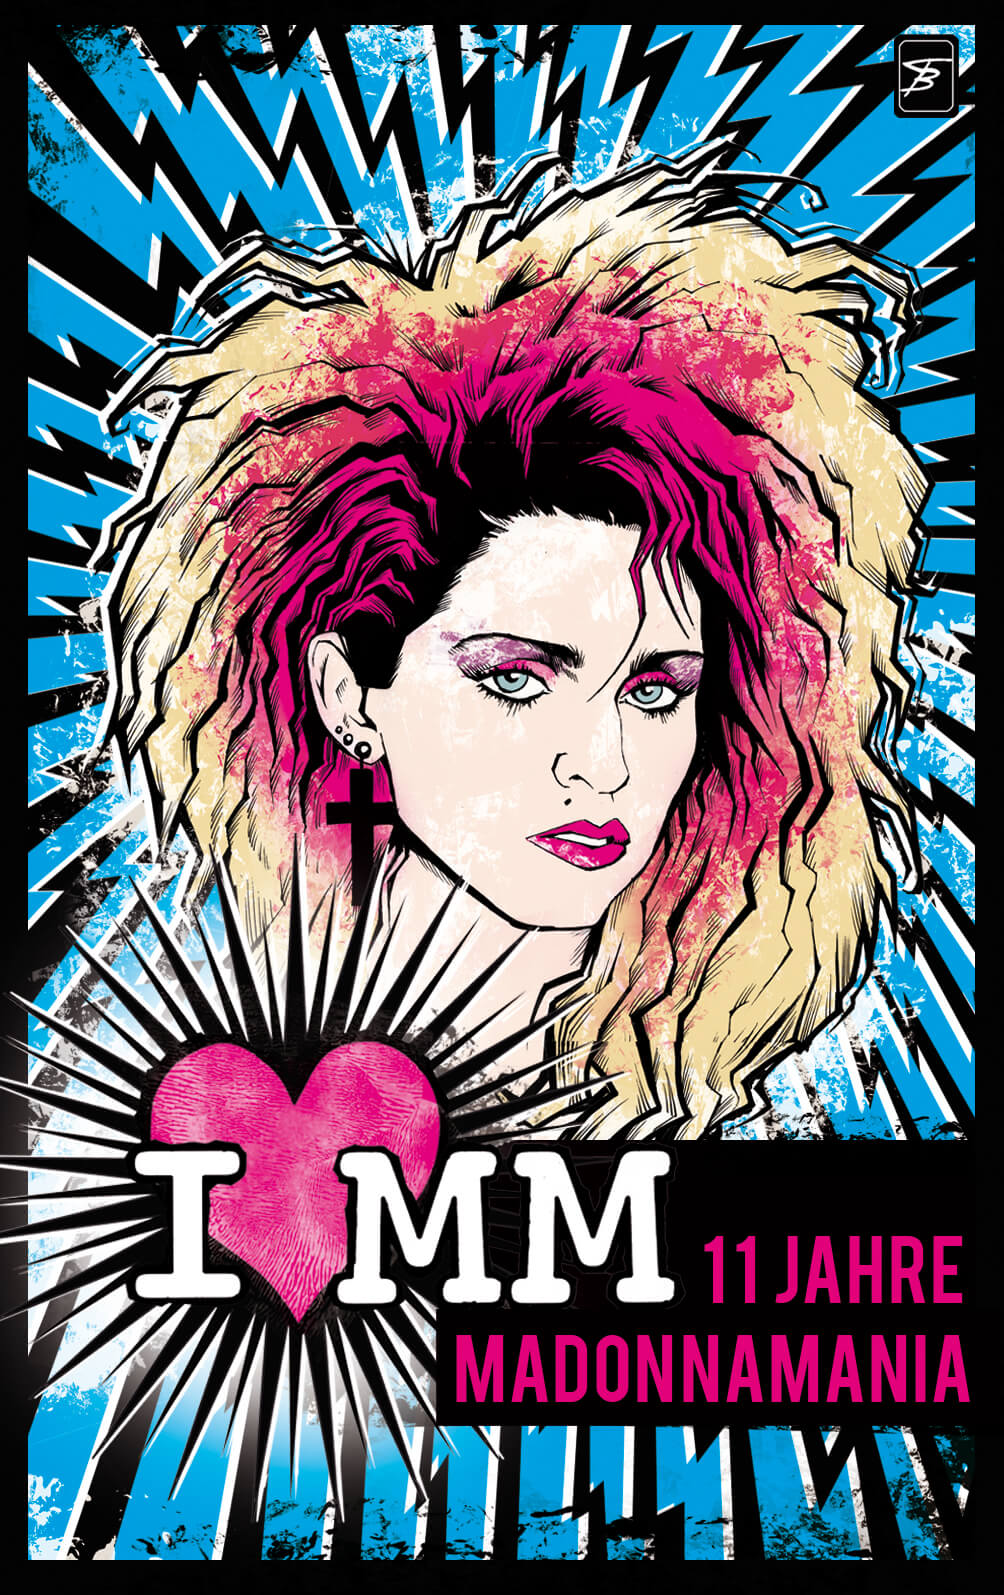 Madonnamania_01_Webt